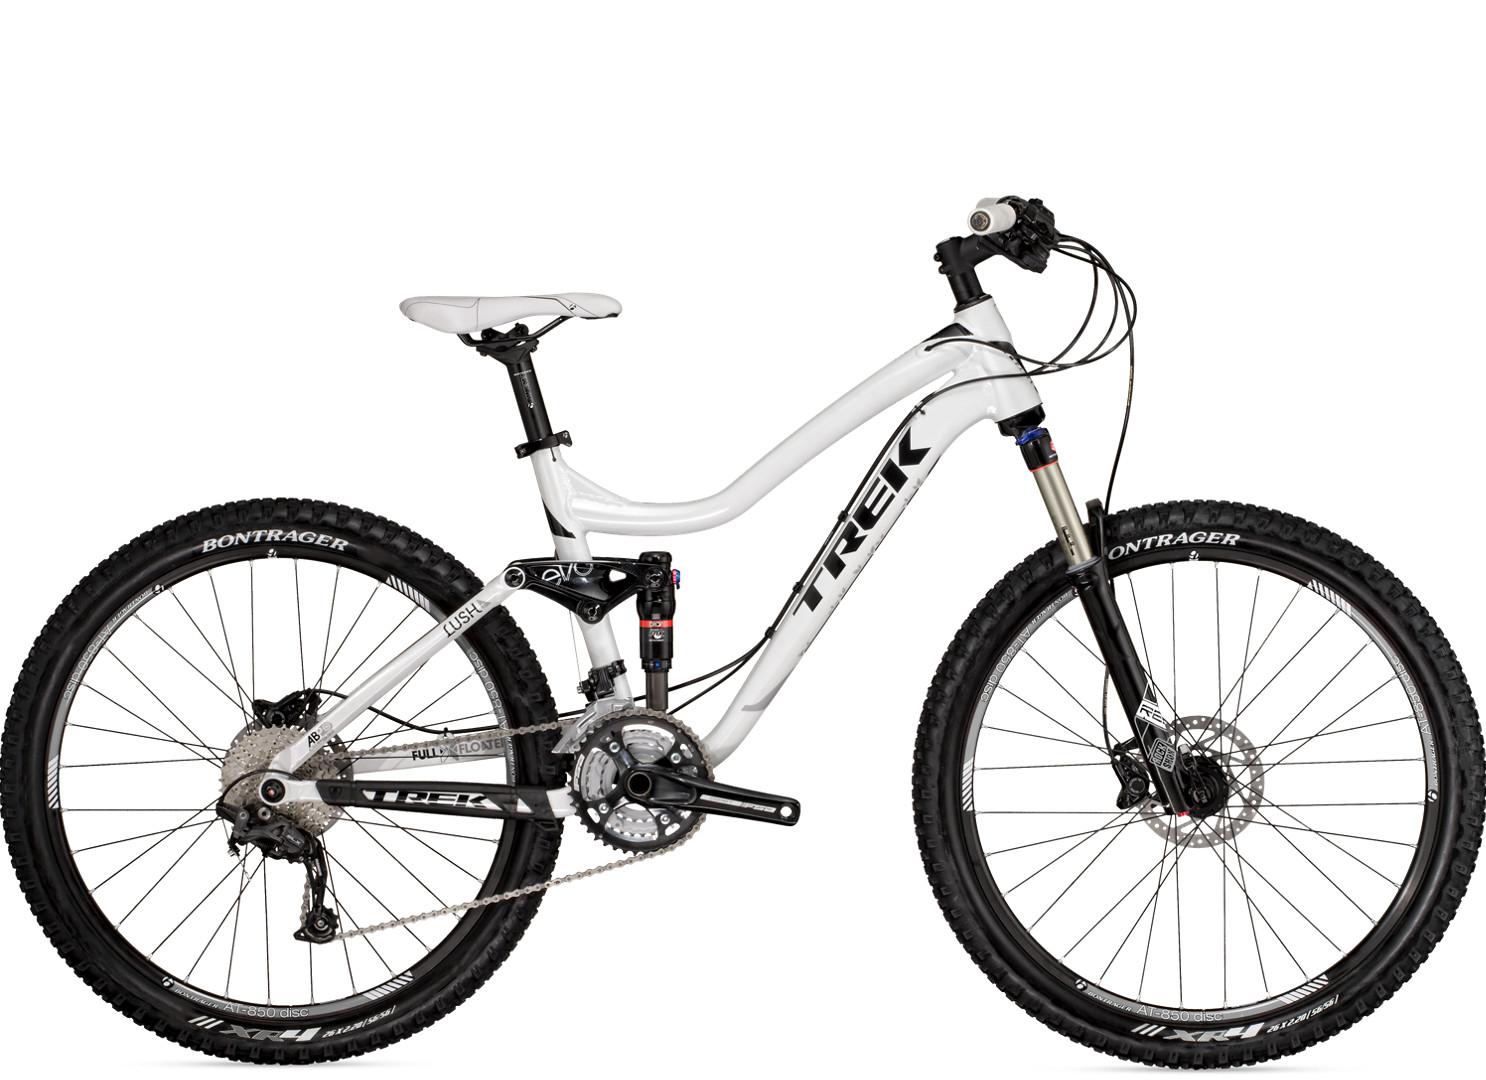 2012 Trek Lush S Bike 26907